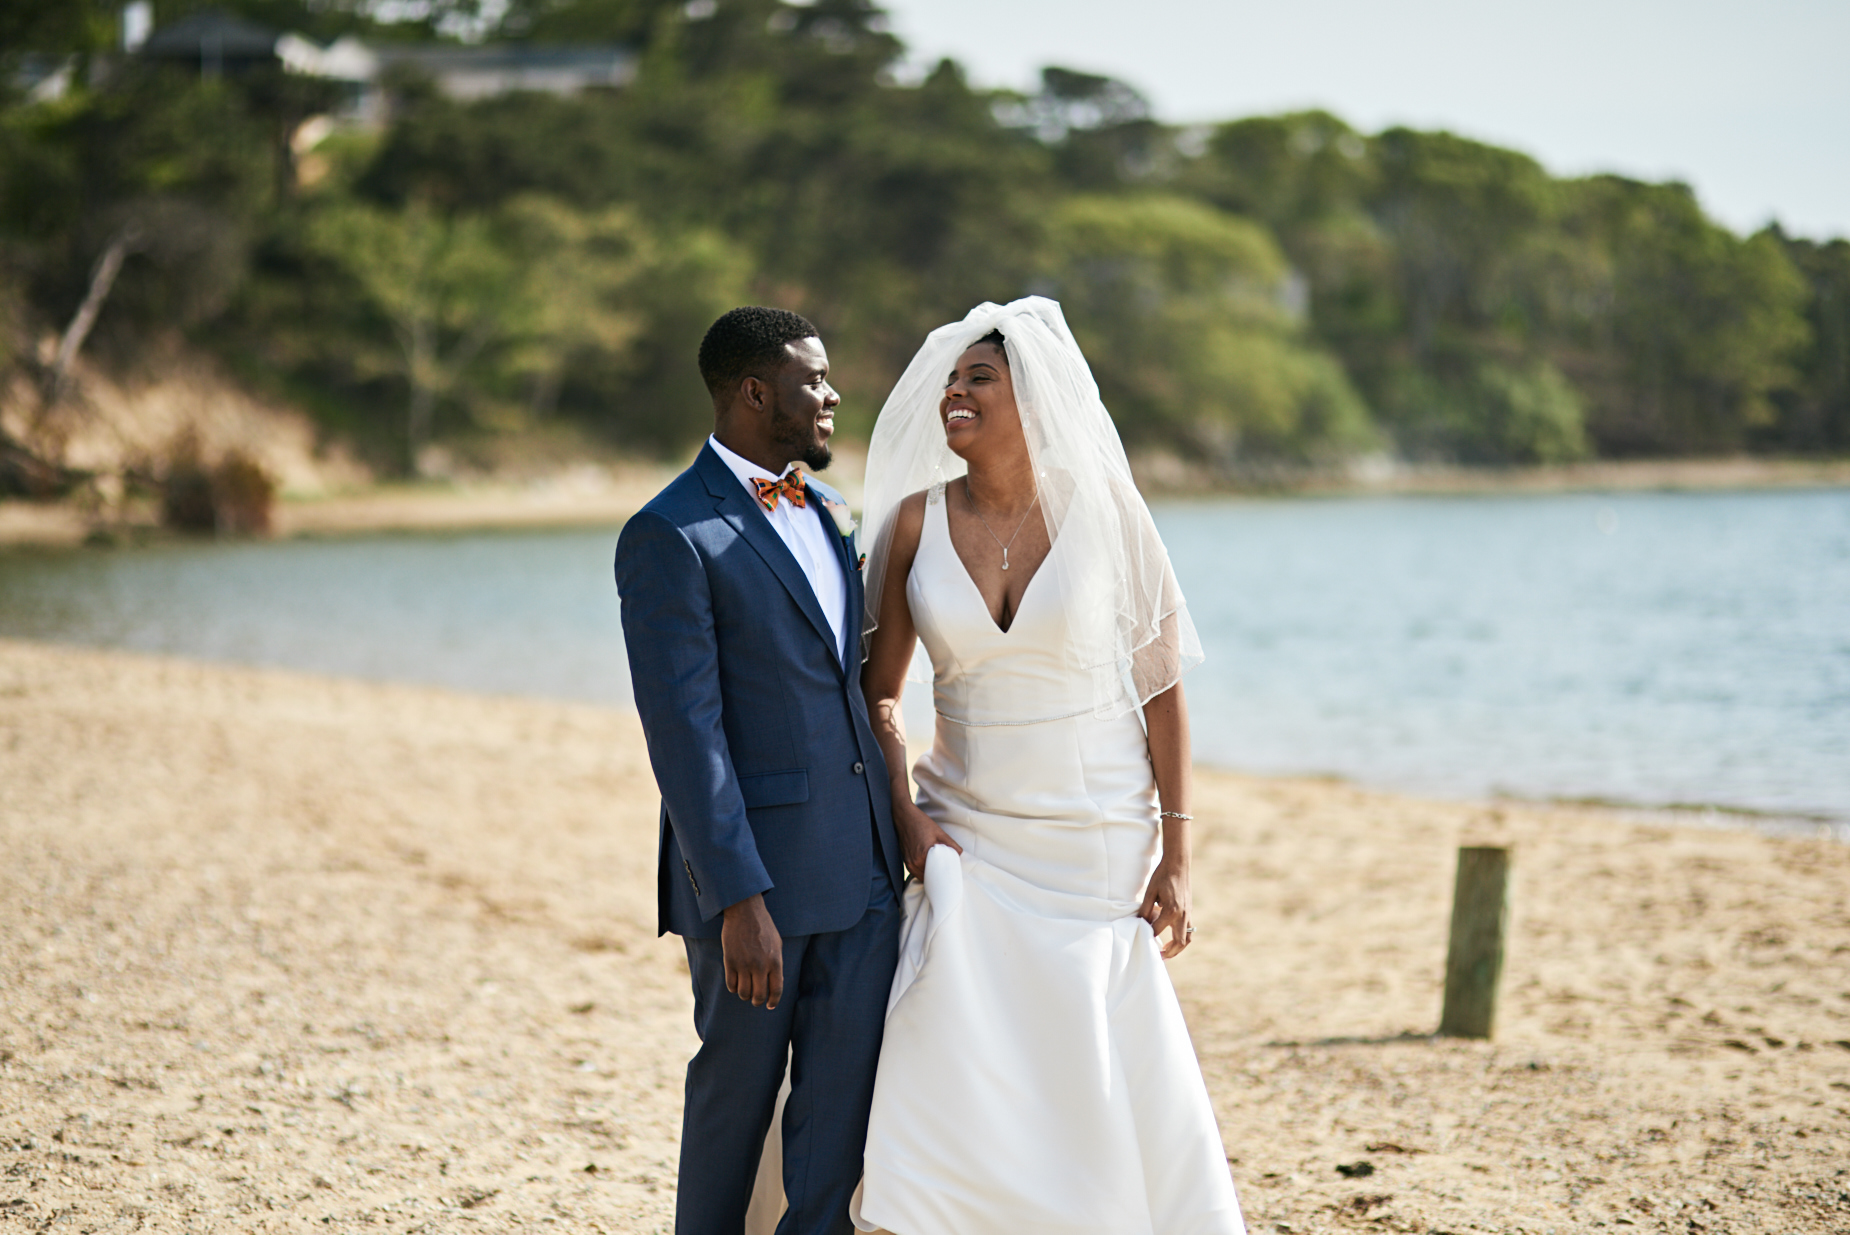 Wedding Photography by Cate Bligh | Martha's Vineyard Dream Destination Wedding at Sailing Camp Park in Oak Bluffs, MA